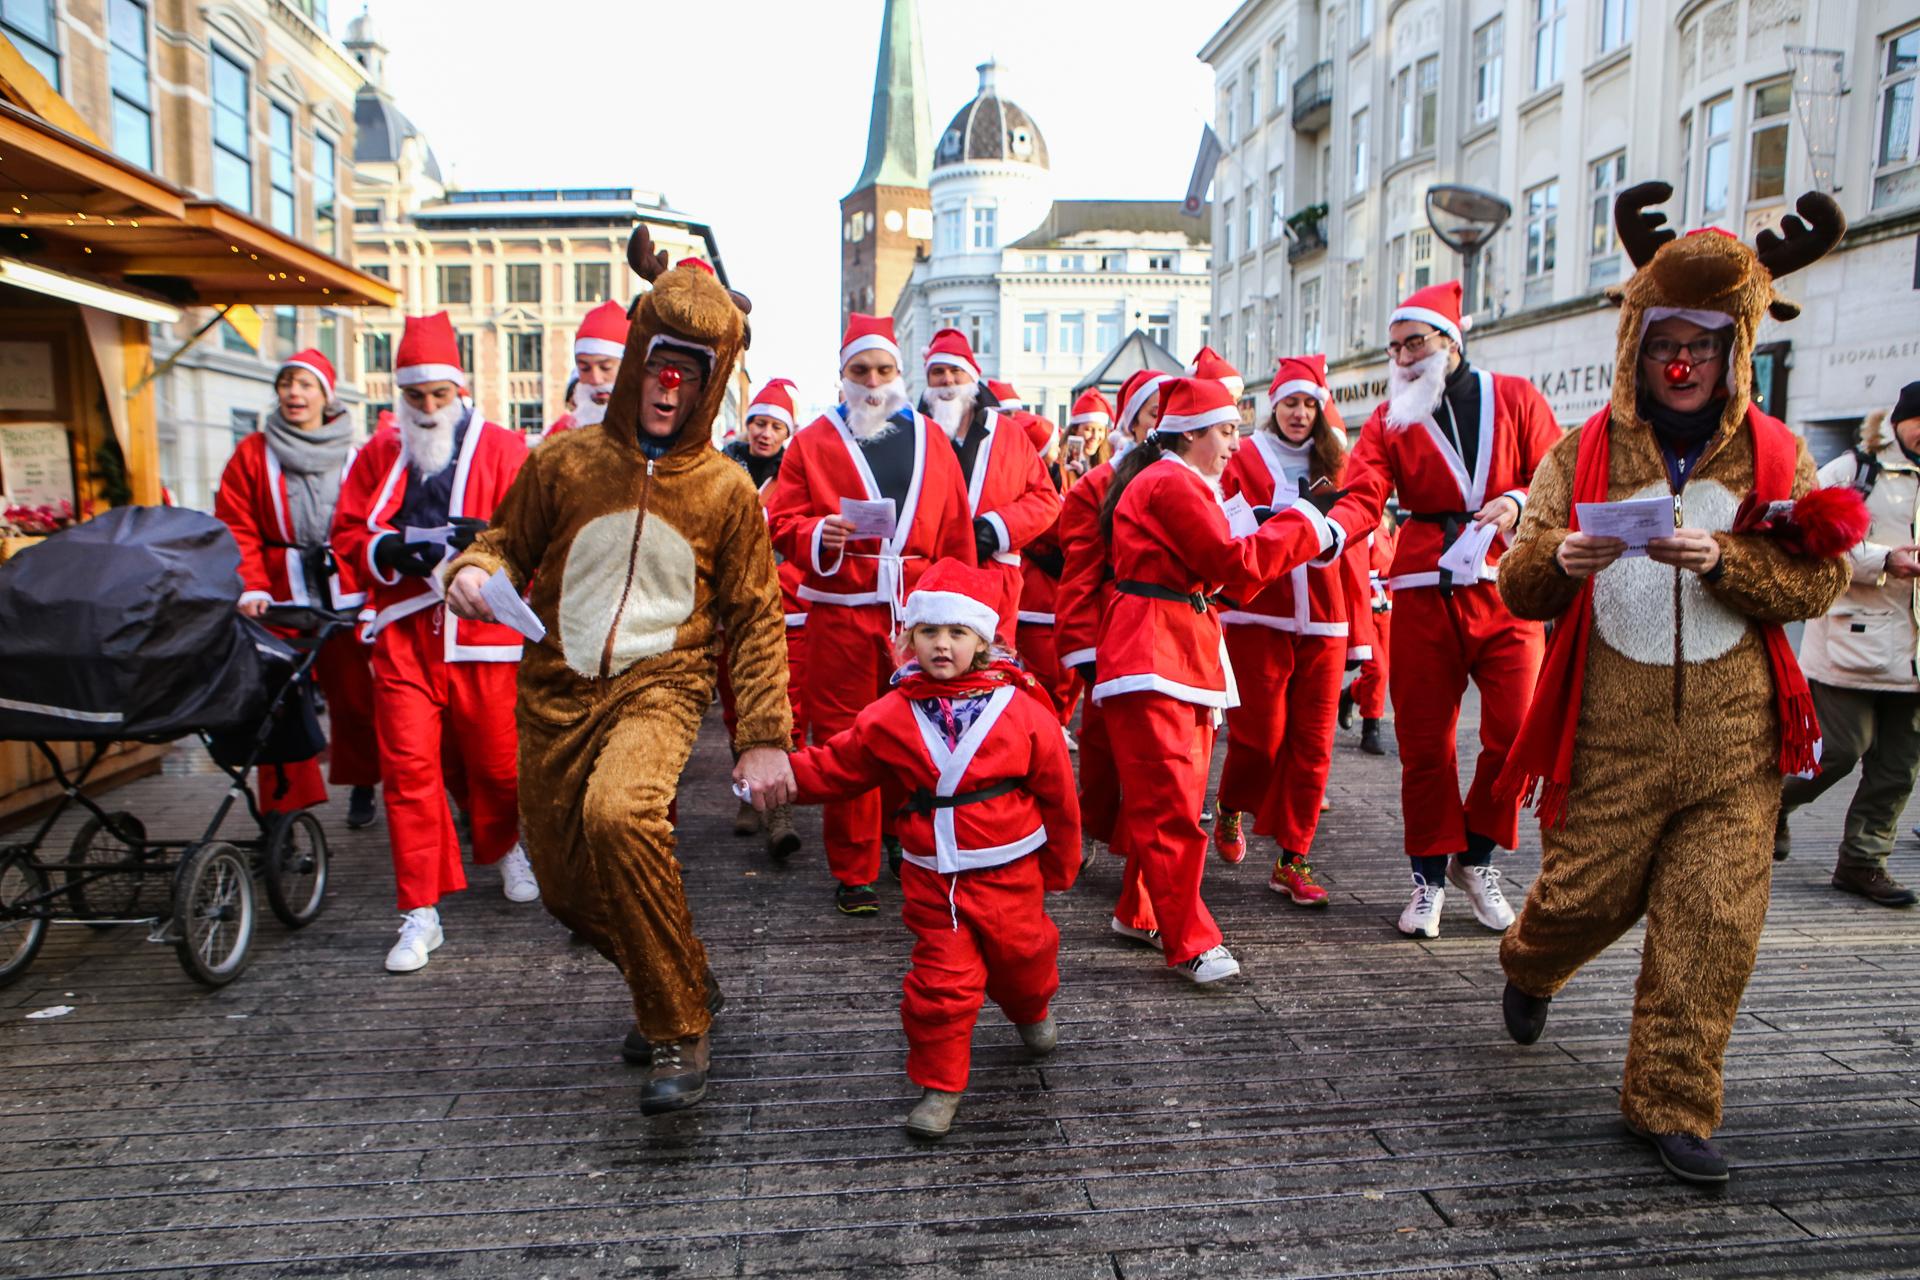 Lyngby, Julemand, juletræ